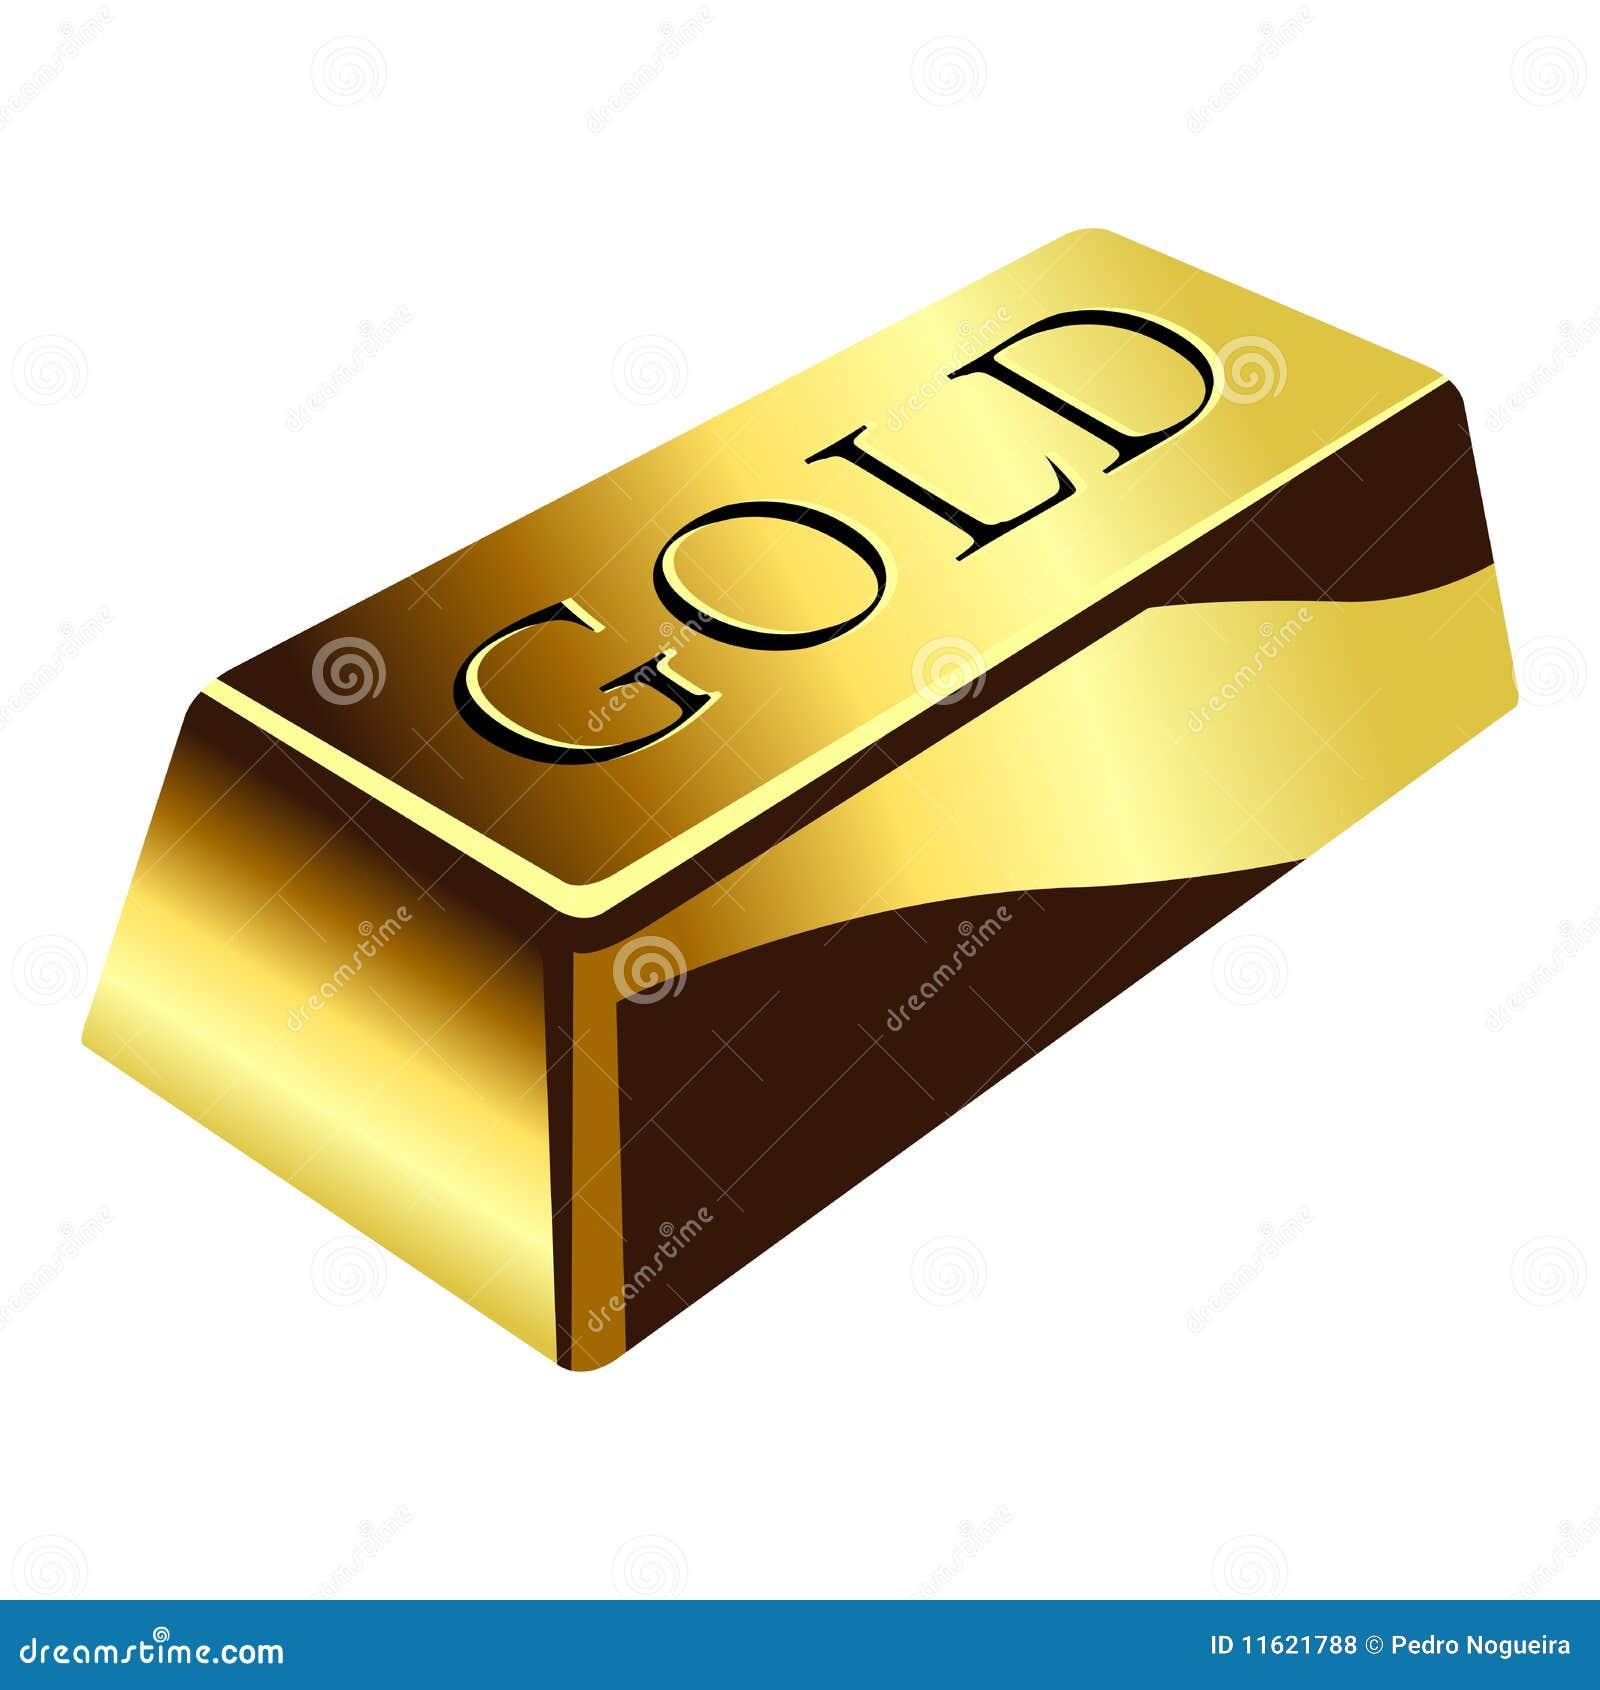 Gold bar royalty free stock photos image 11621788 - Images of bars ...